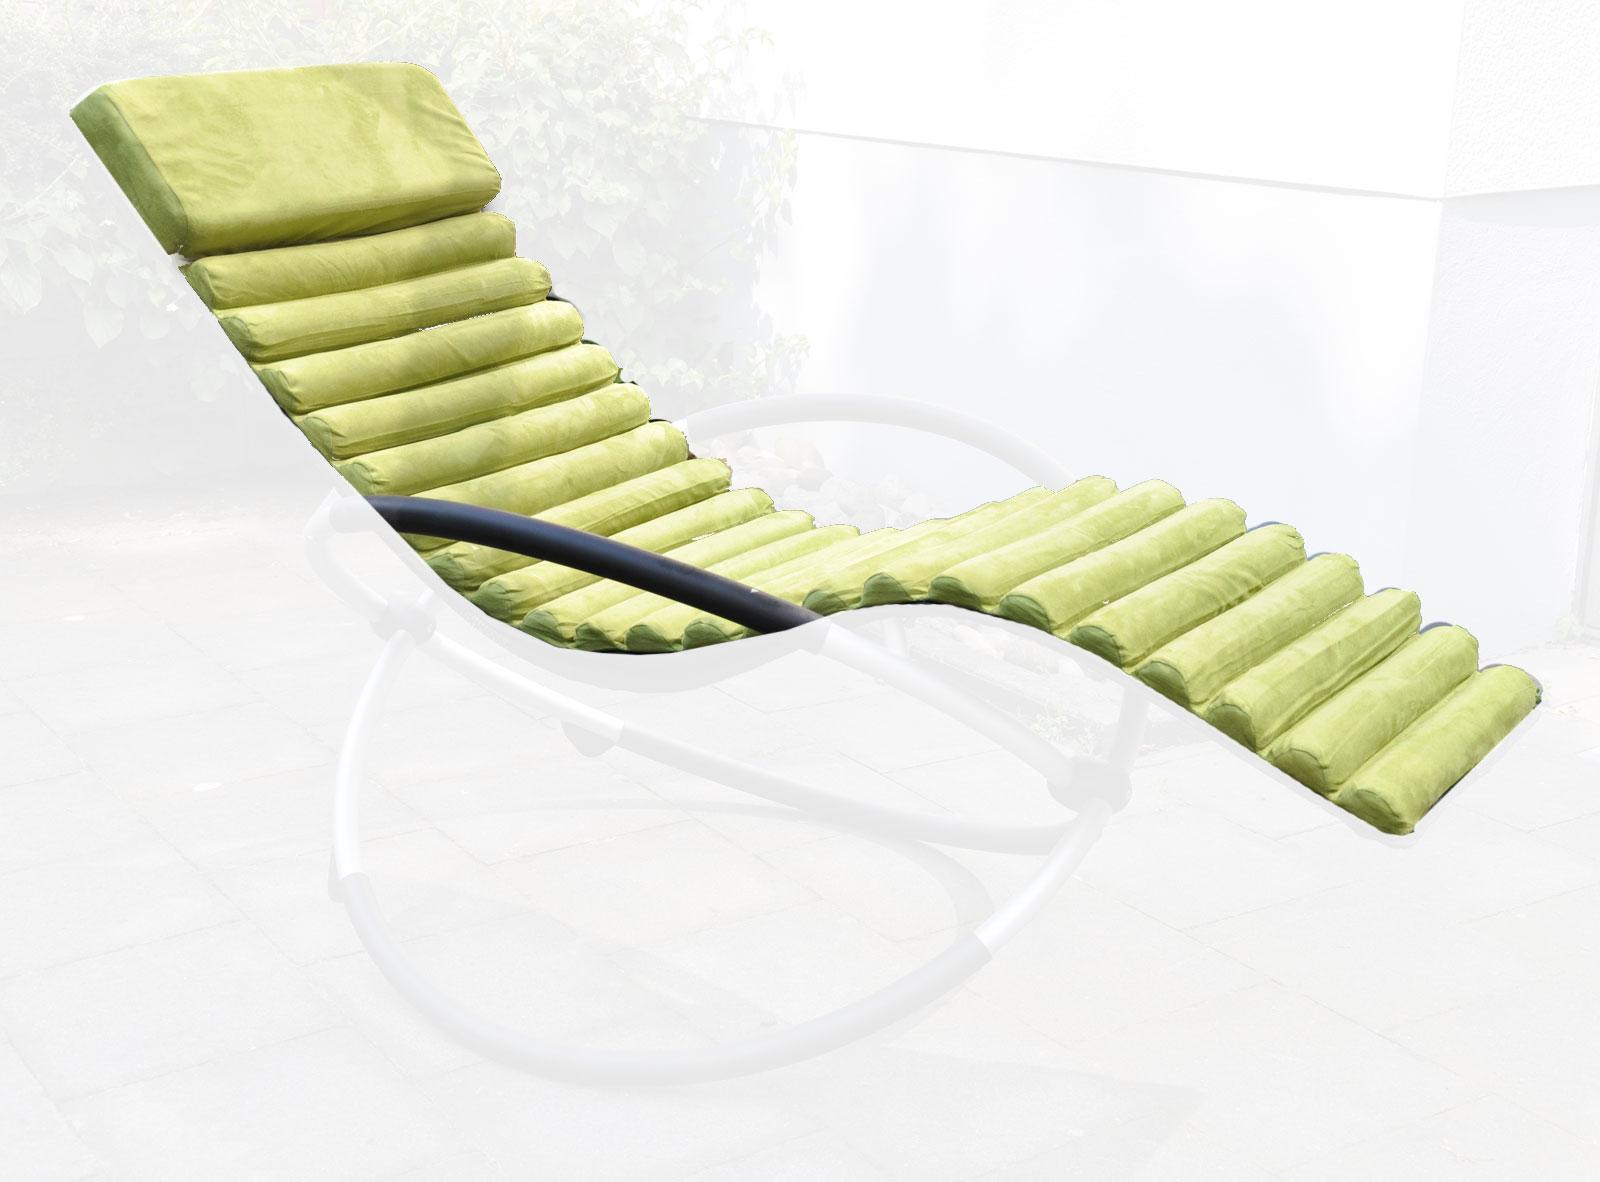 polster auflage f r sonnenliege gr n bei. Black Bedroom Furniture Sets. Home Design Ideas